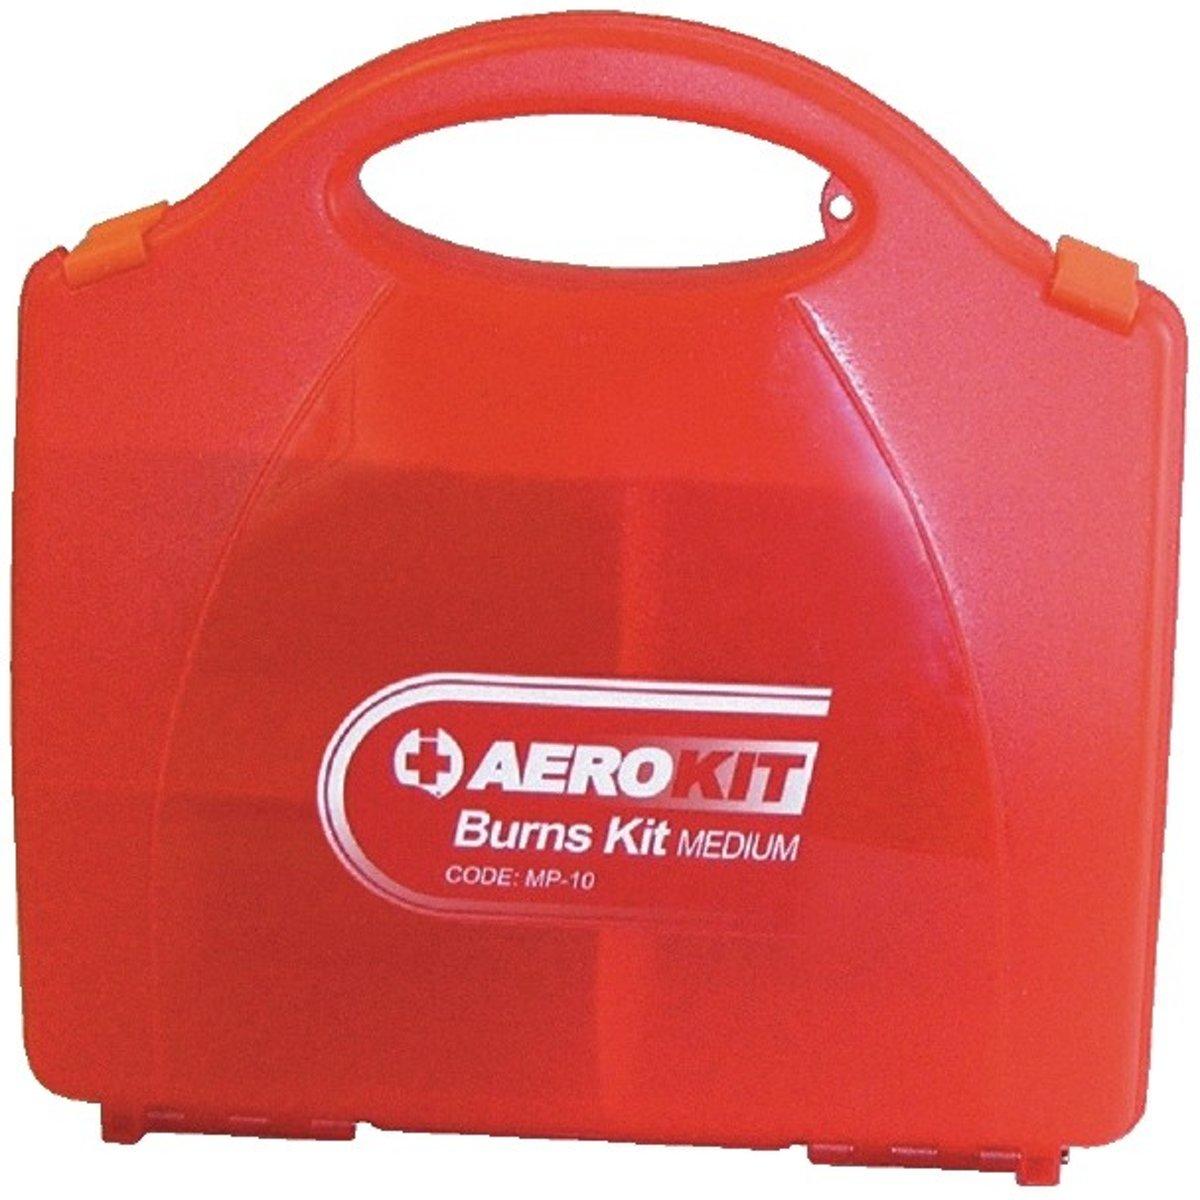 Aeroburn brandwondenset medium